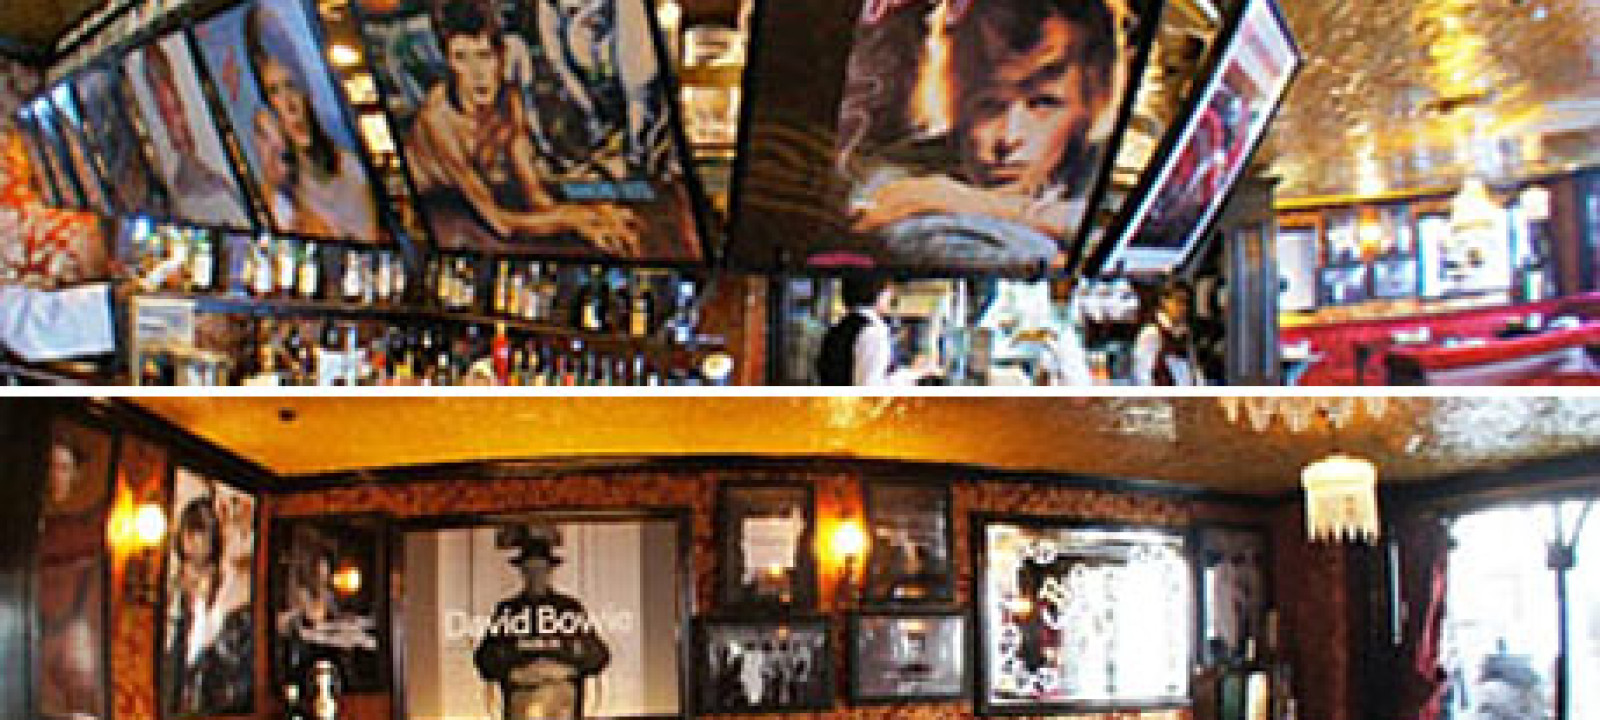 Bowie's Bar